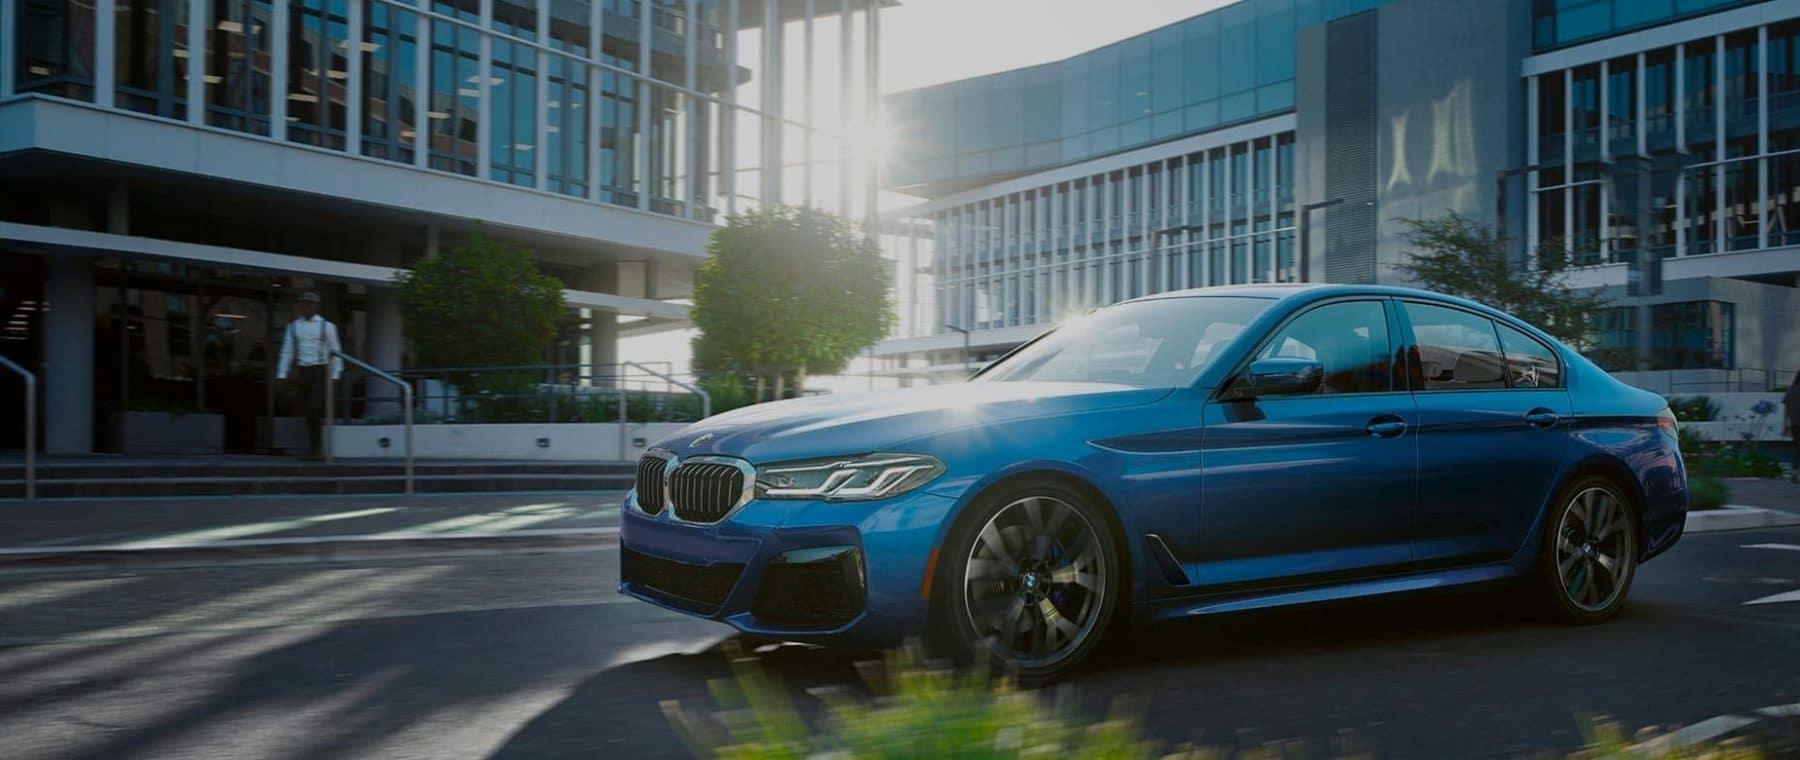 Blue BMW Shining in Sunlight